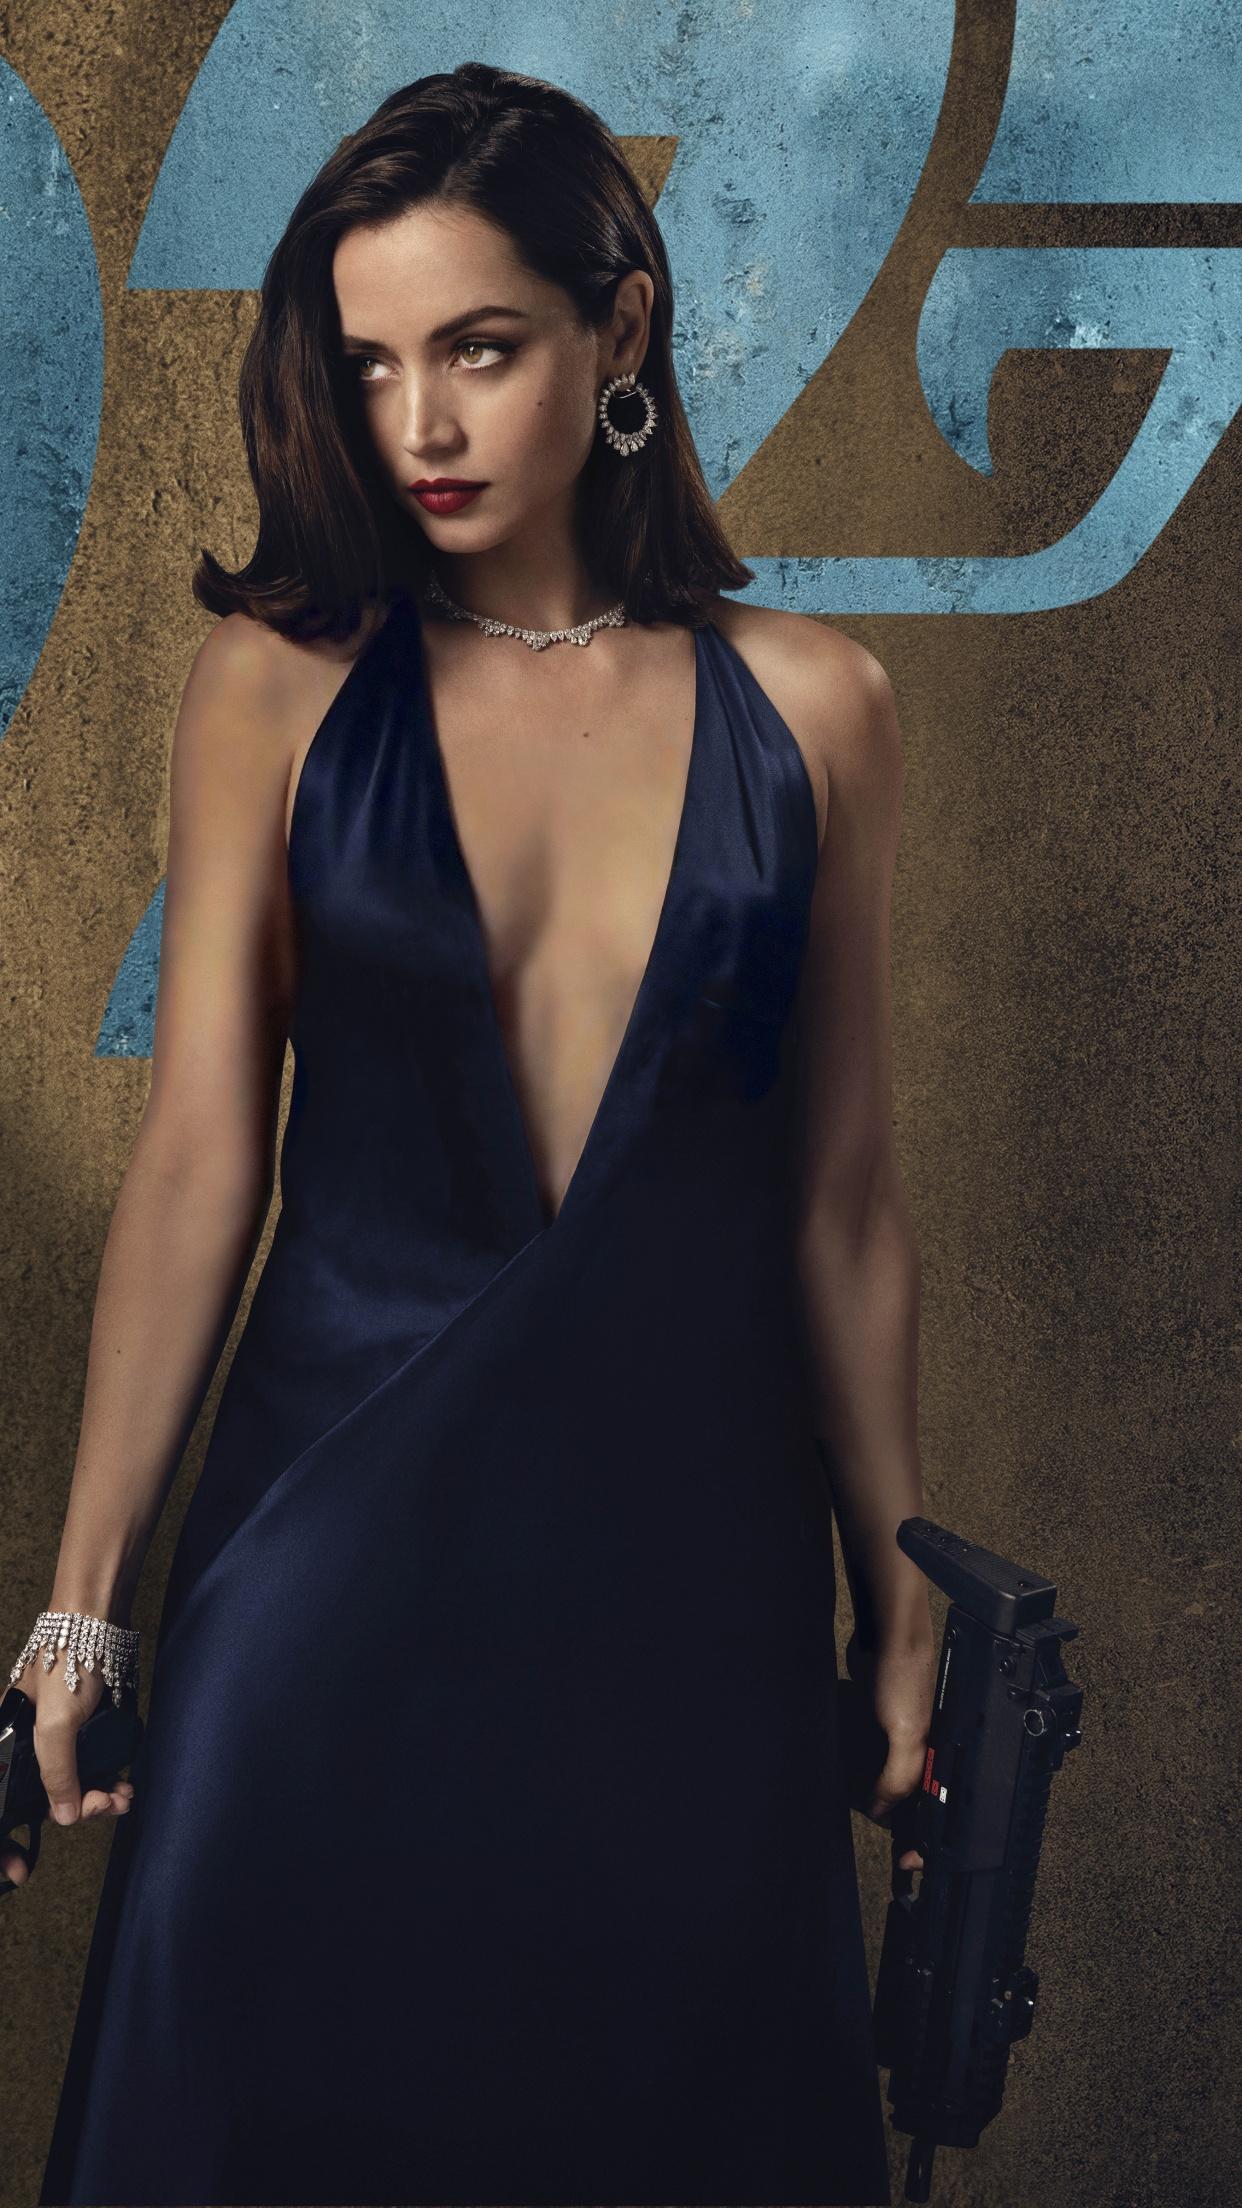 No Time to Die 4K Wallpaper, Ana de Armas, 2020 Movies ...